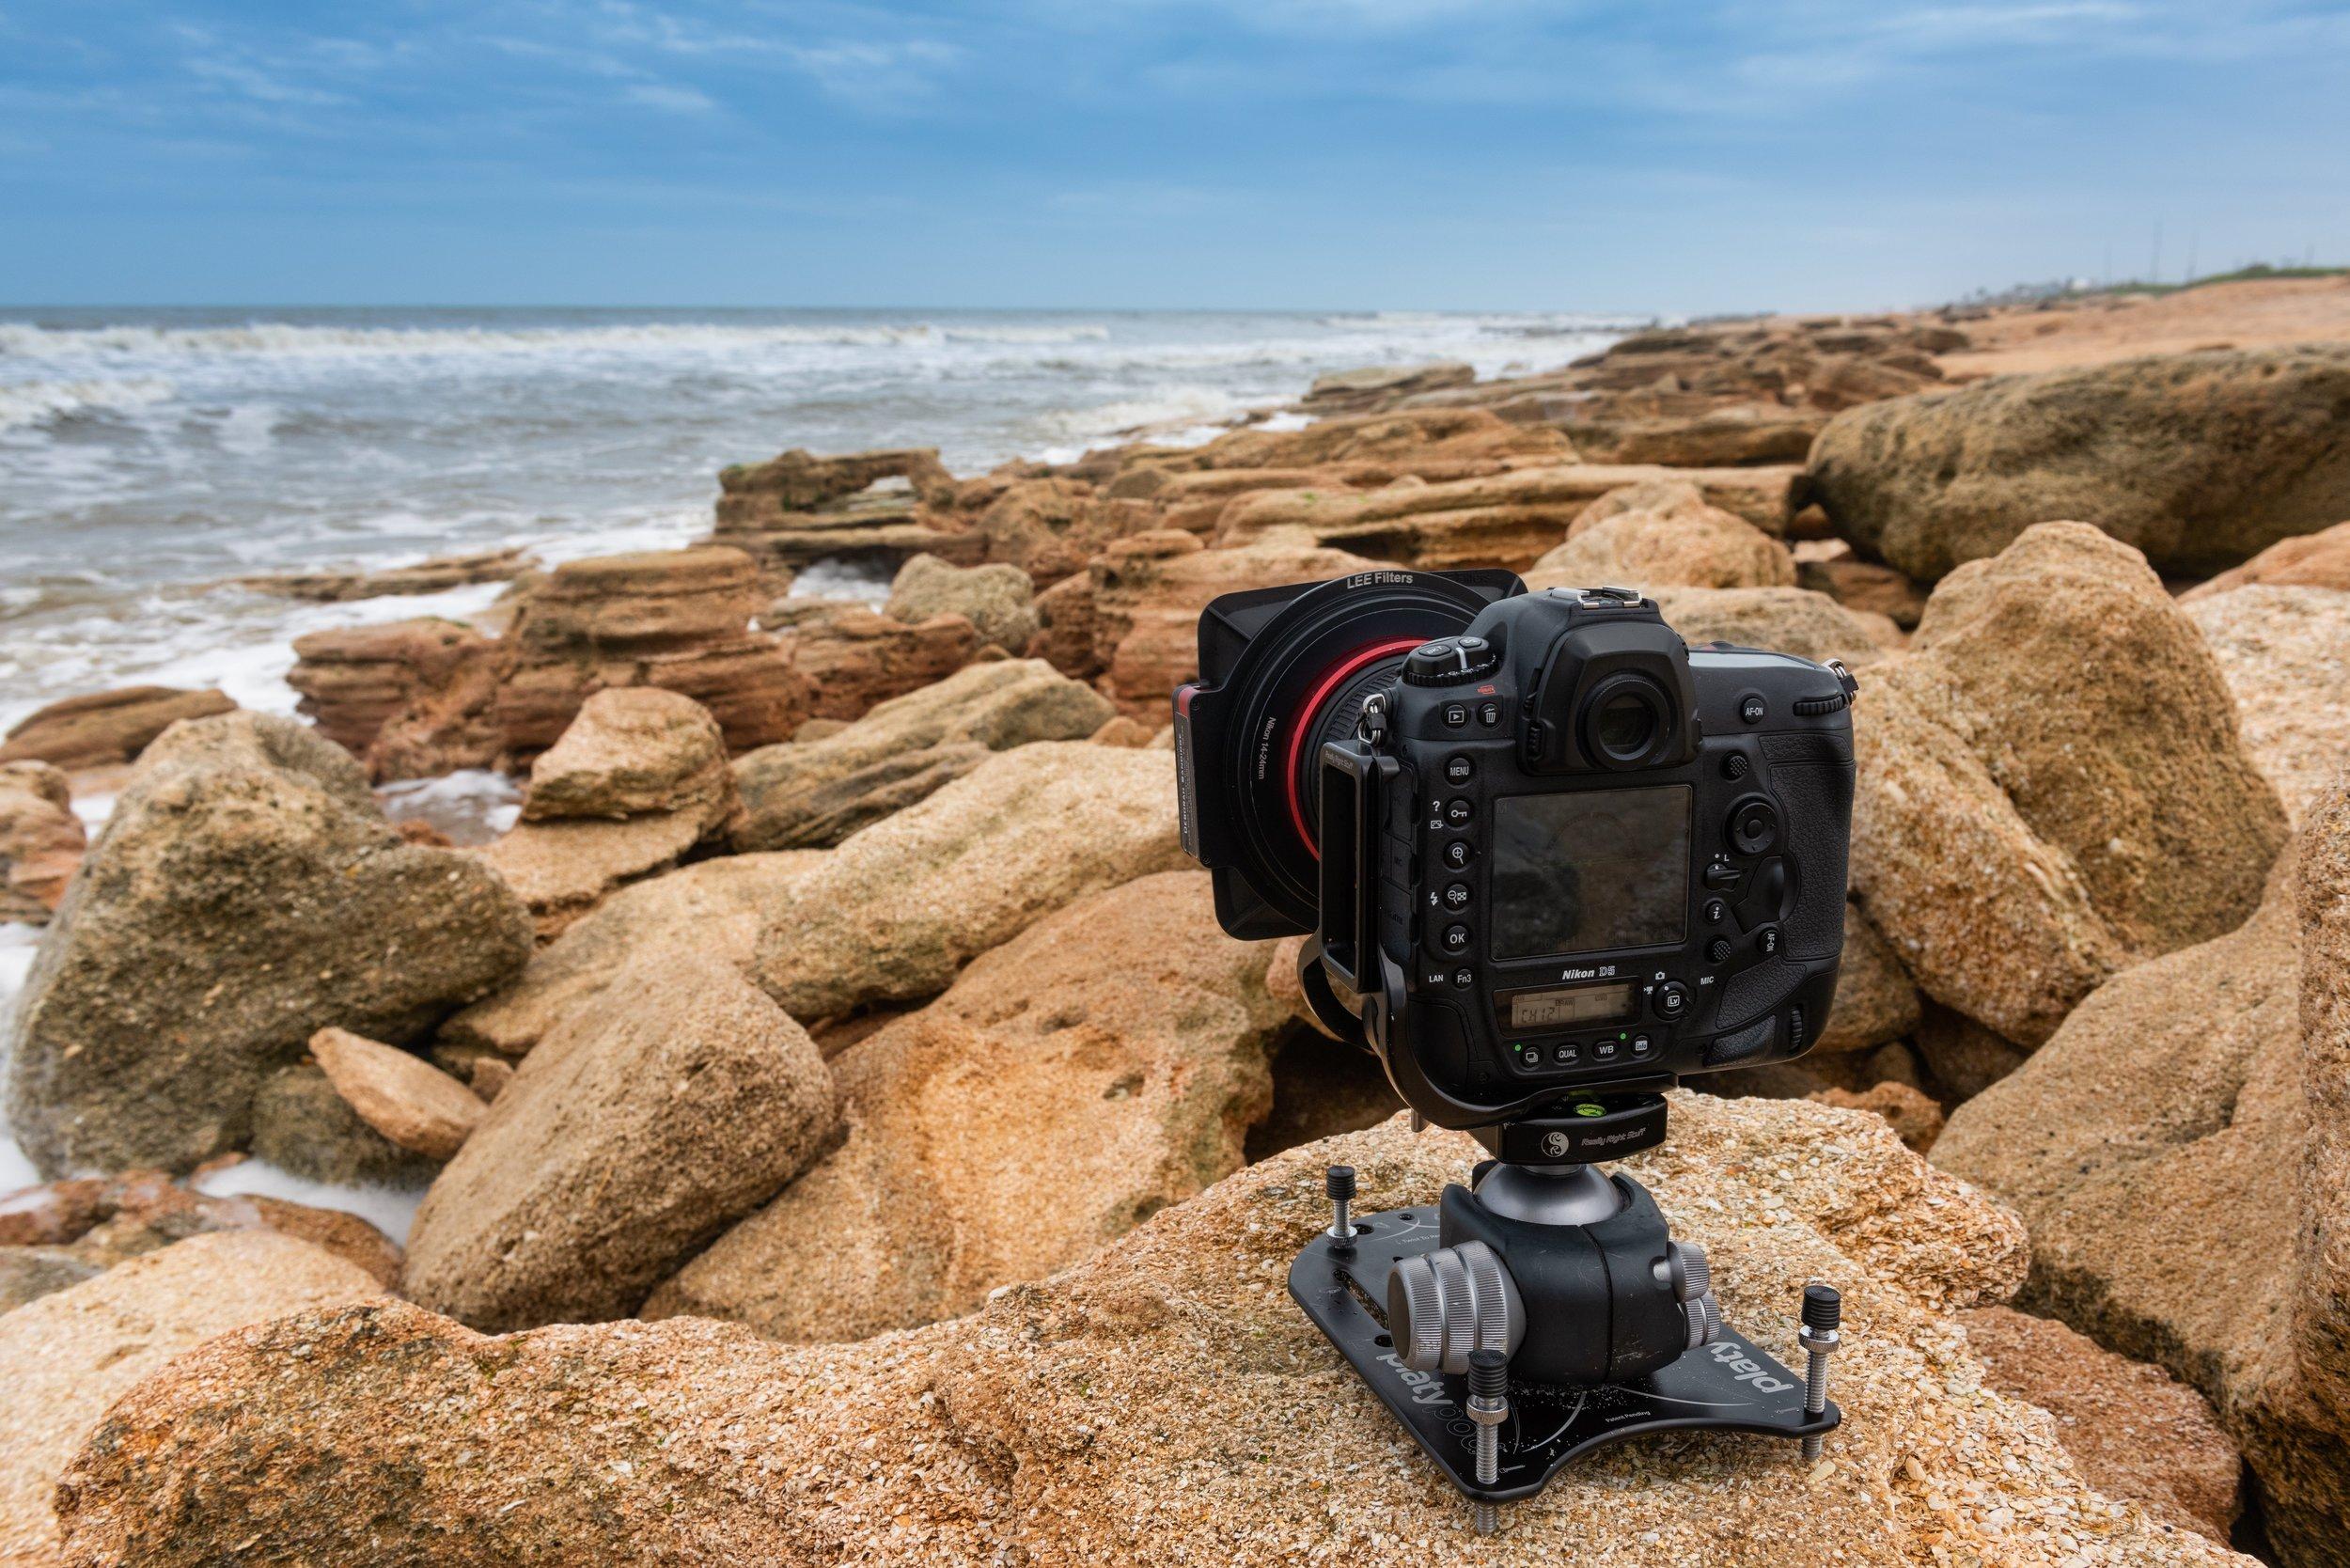 platypod on a rock